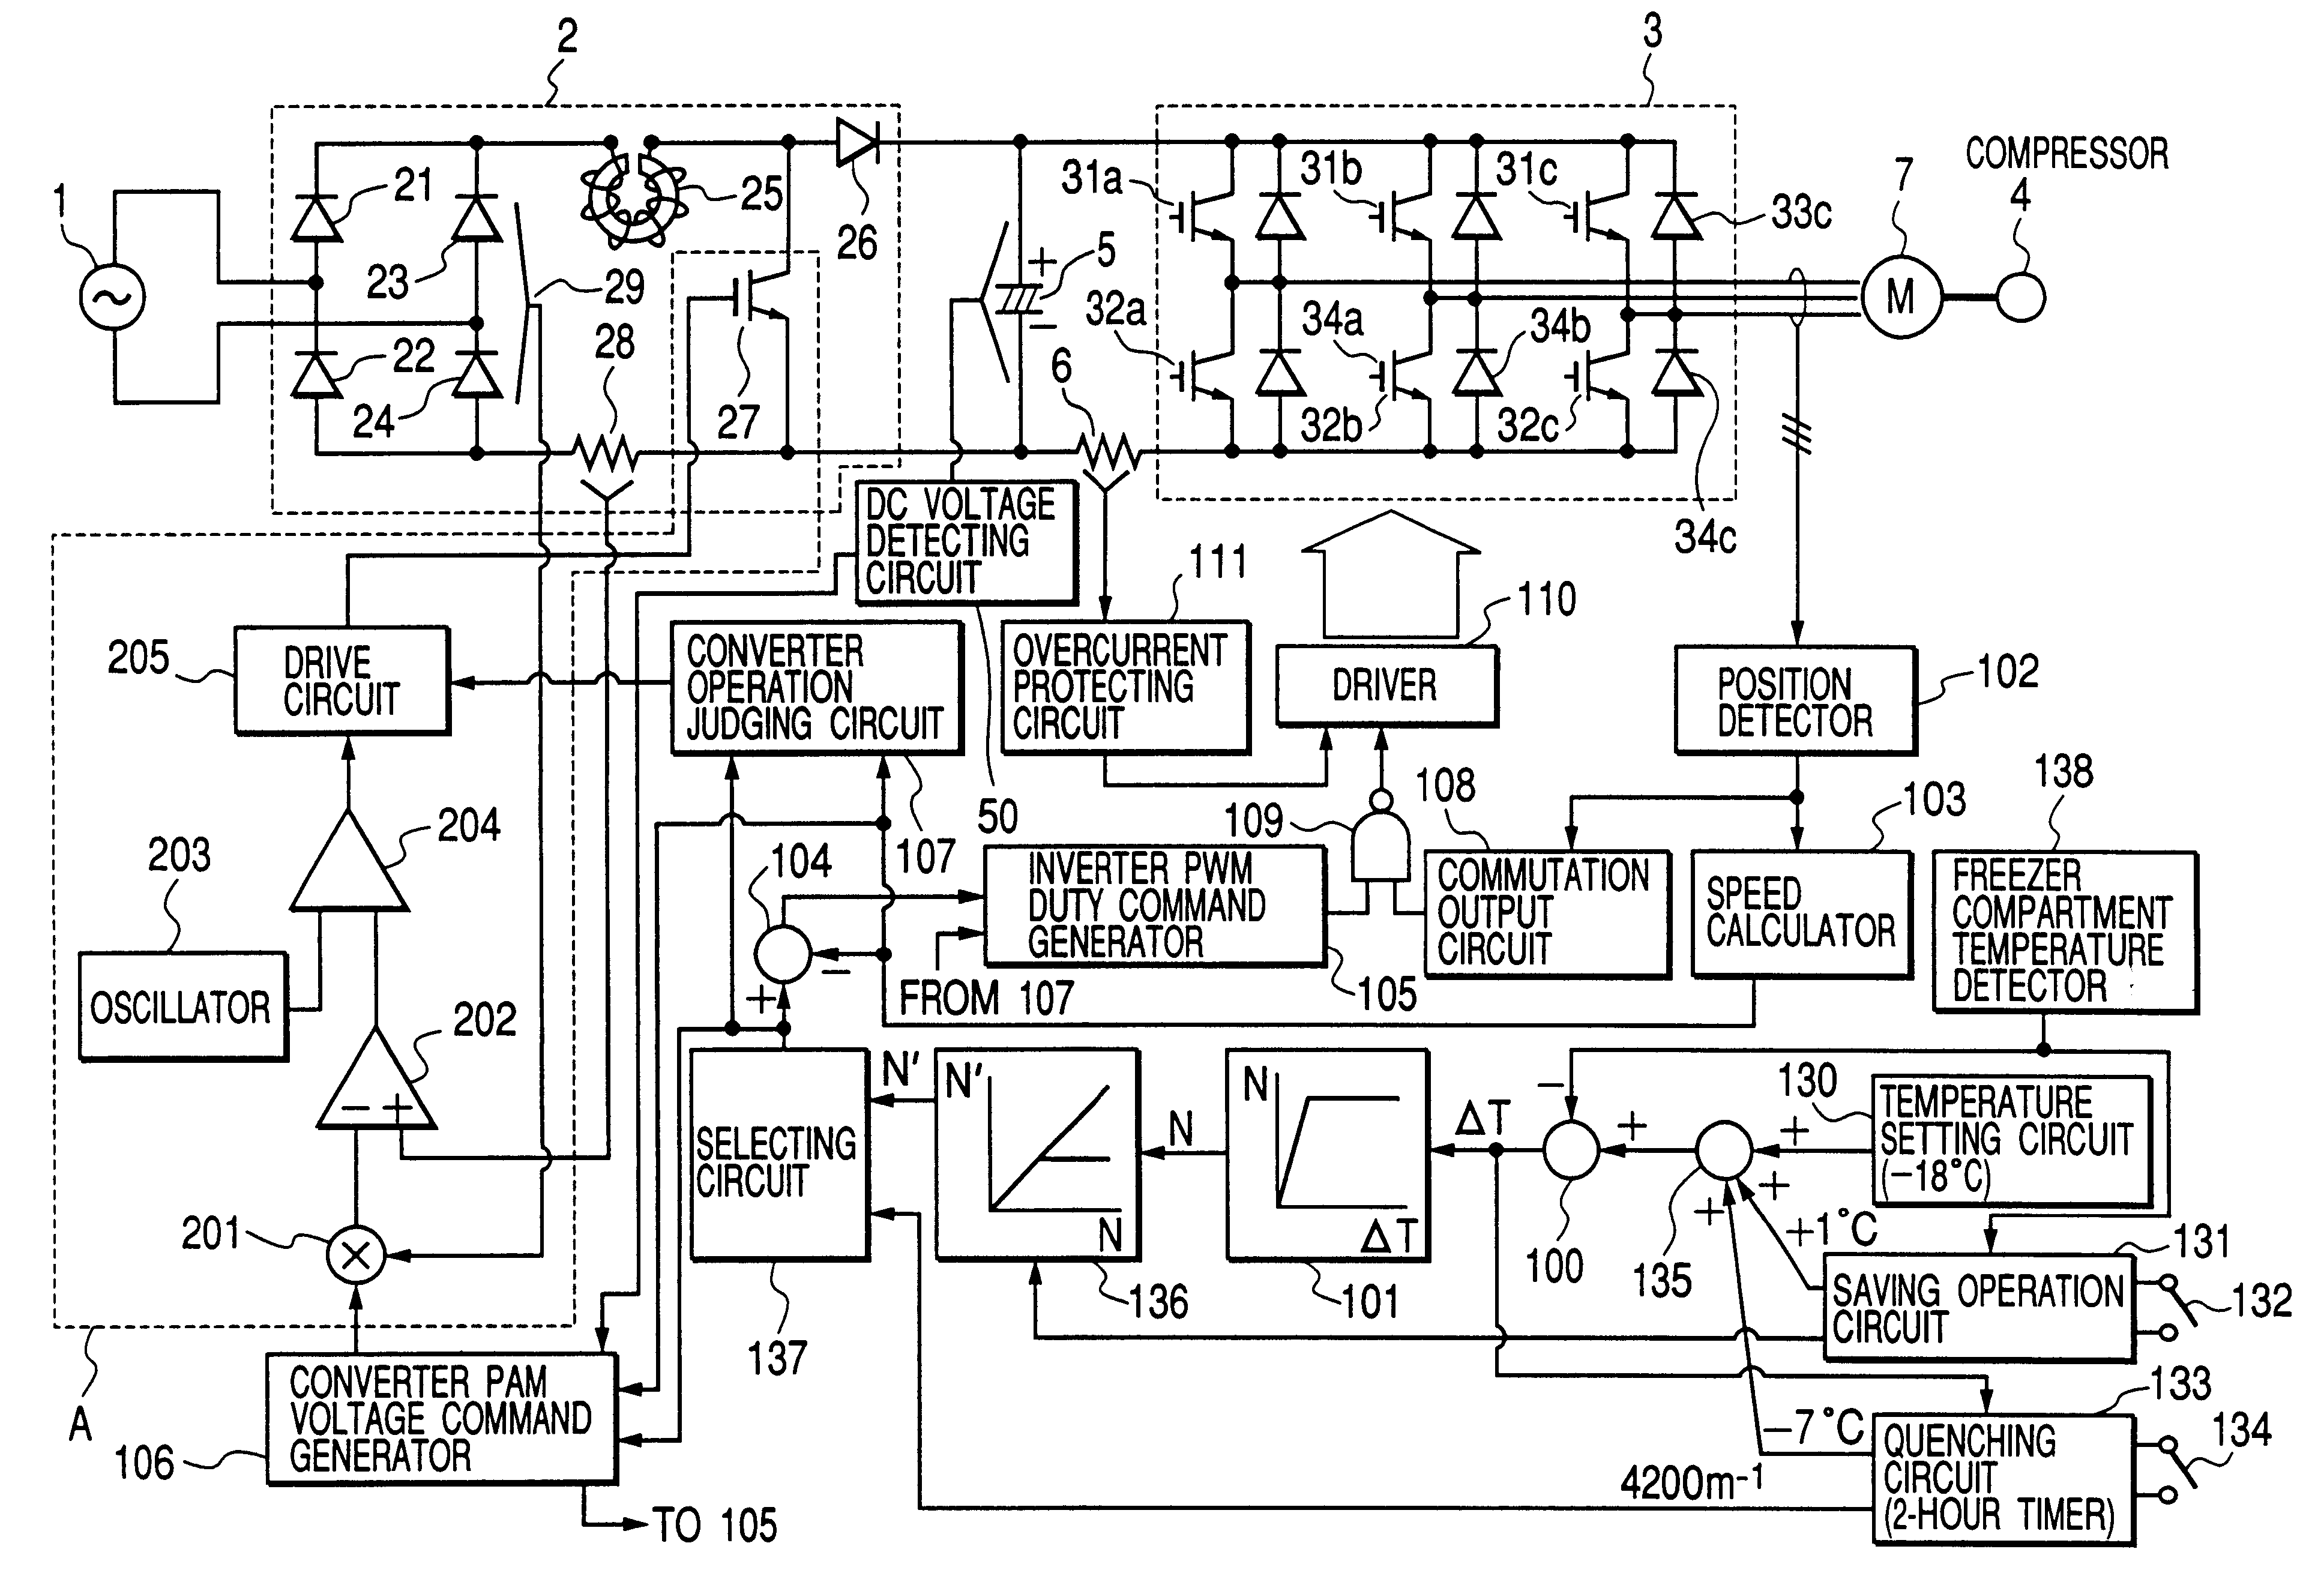 Patent us5262704 protection circuit in john deere 825i wiring diagram circuit diagram of inverter refrigerator circuit and schematics us06244061 20010612 d00000 circuit diagram of inverter refrigerator asfbconference2016 Images